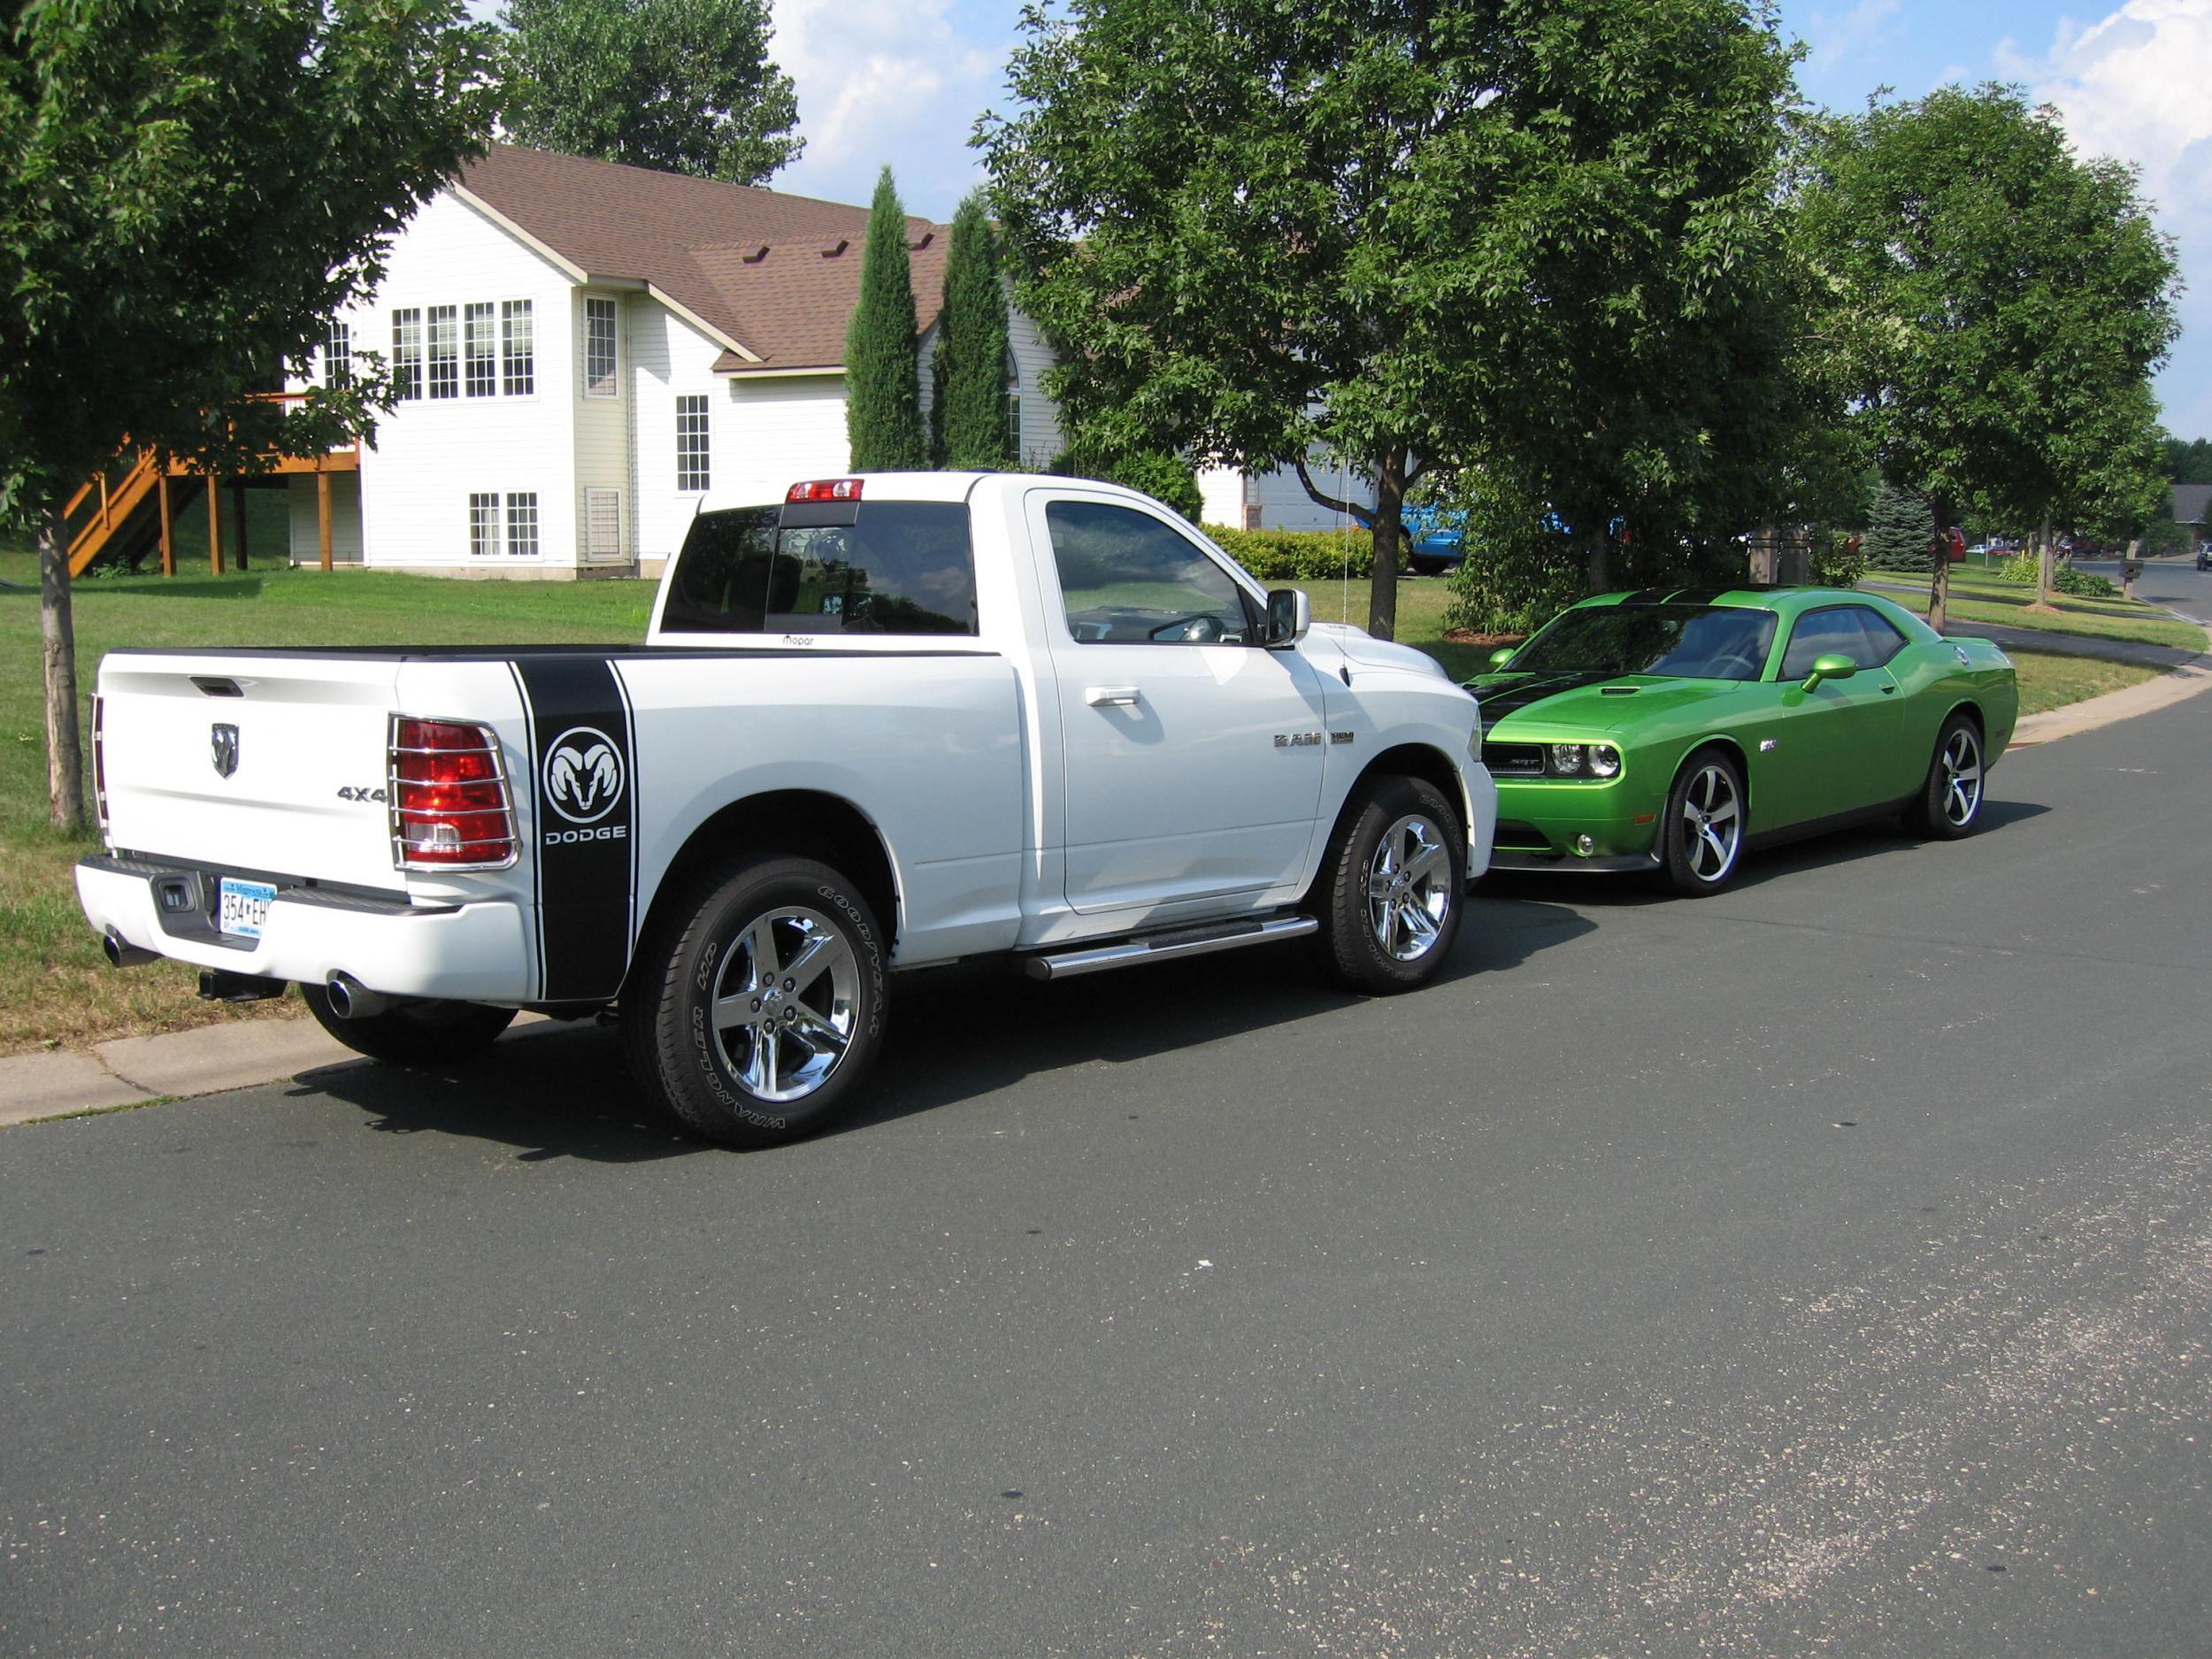 Trucks! Show us watcha got!-079.jpg